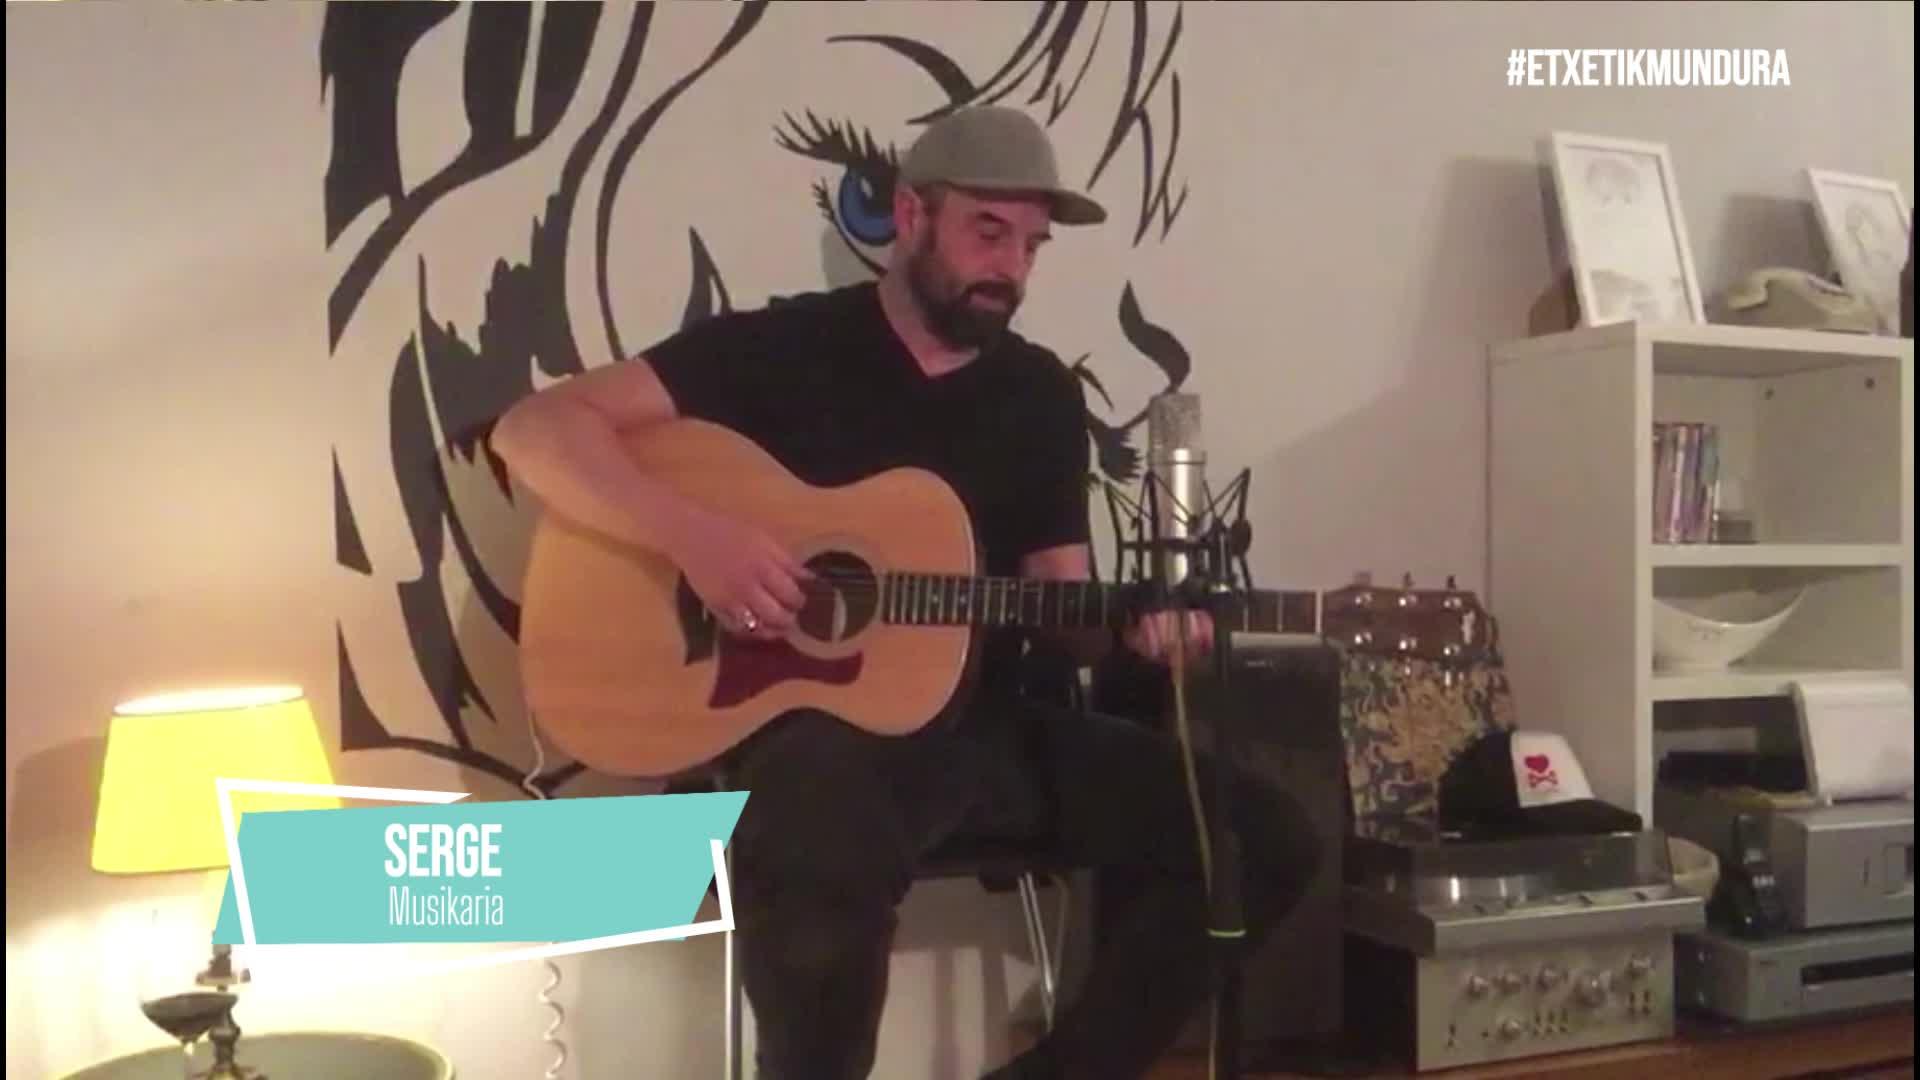 Serge musikaria etxetik mundura